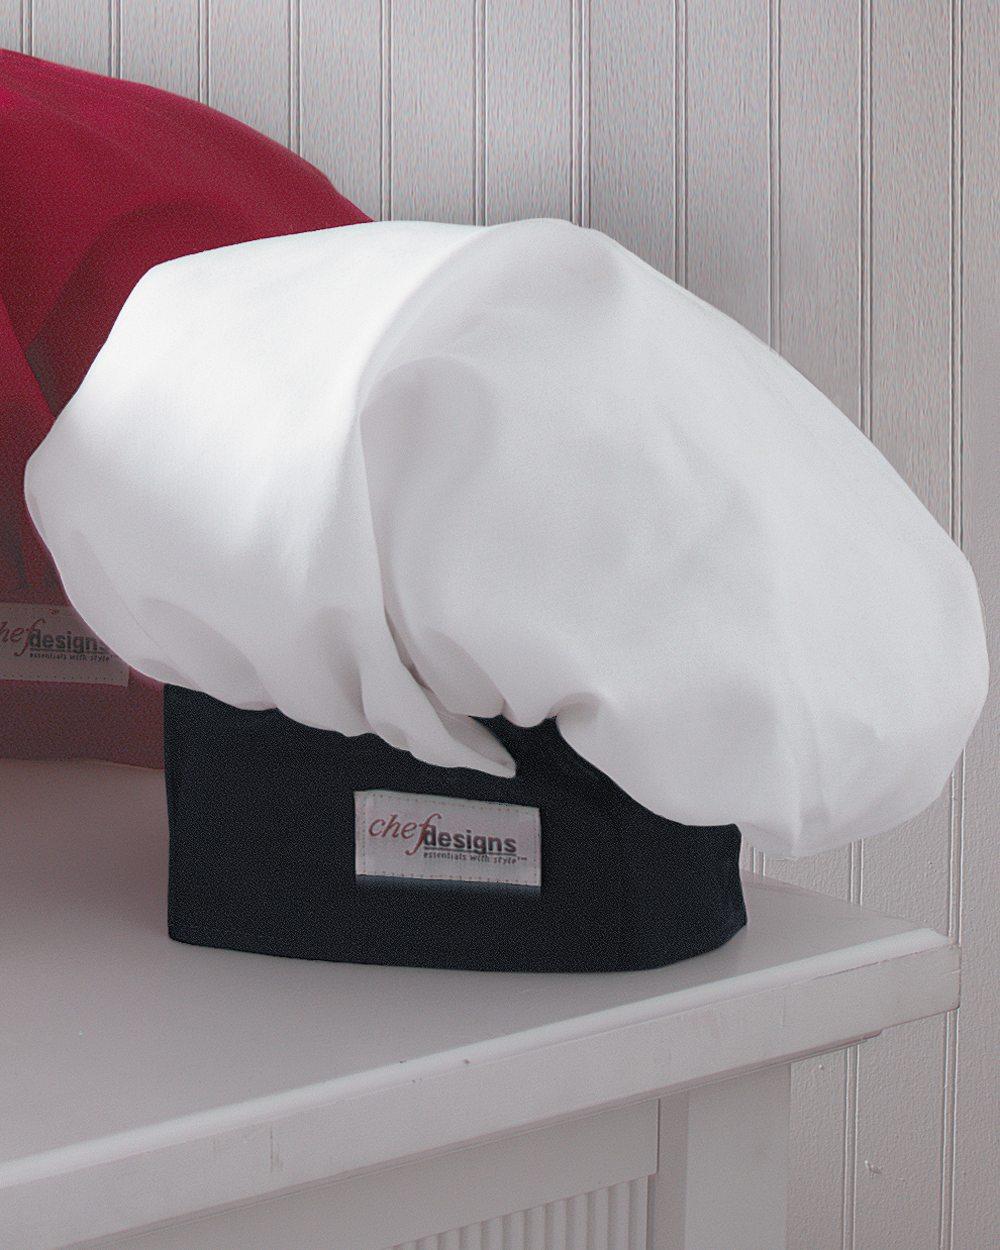 Chef Designs HP60 Chef Hat